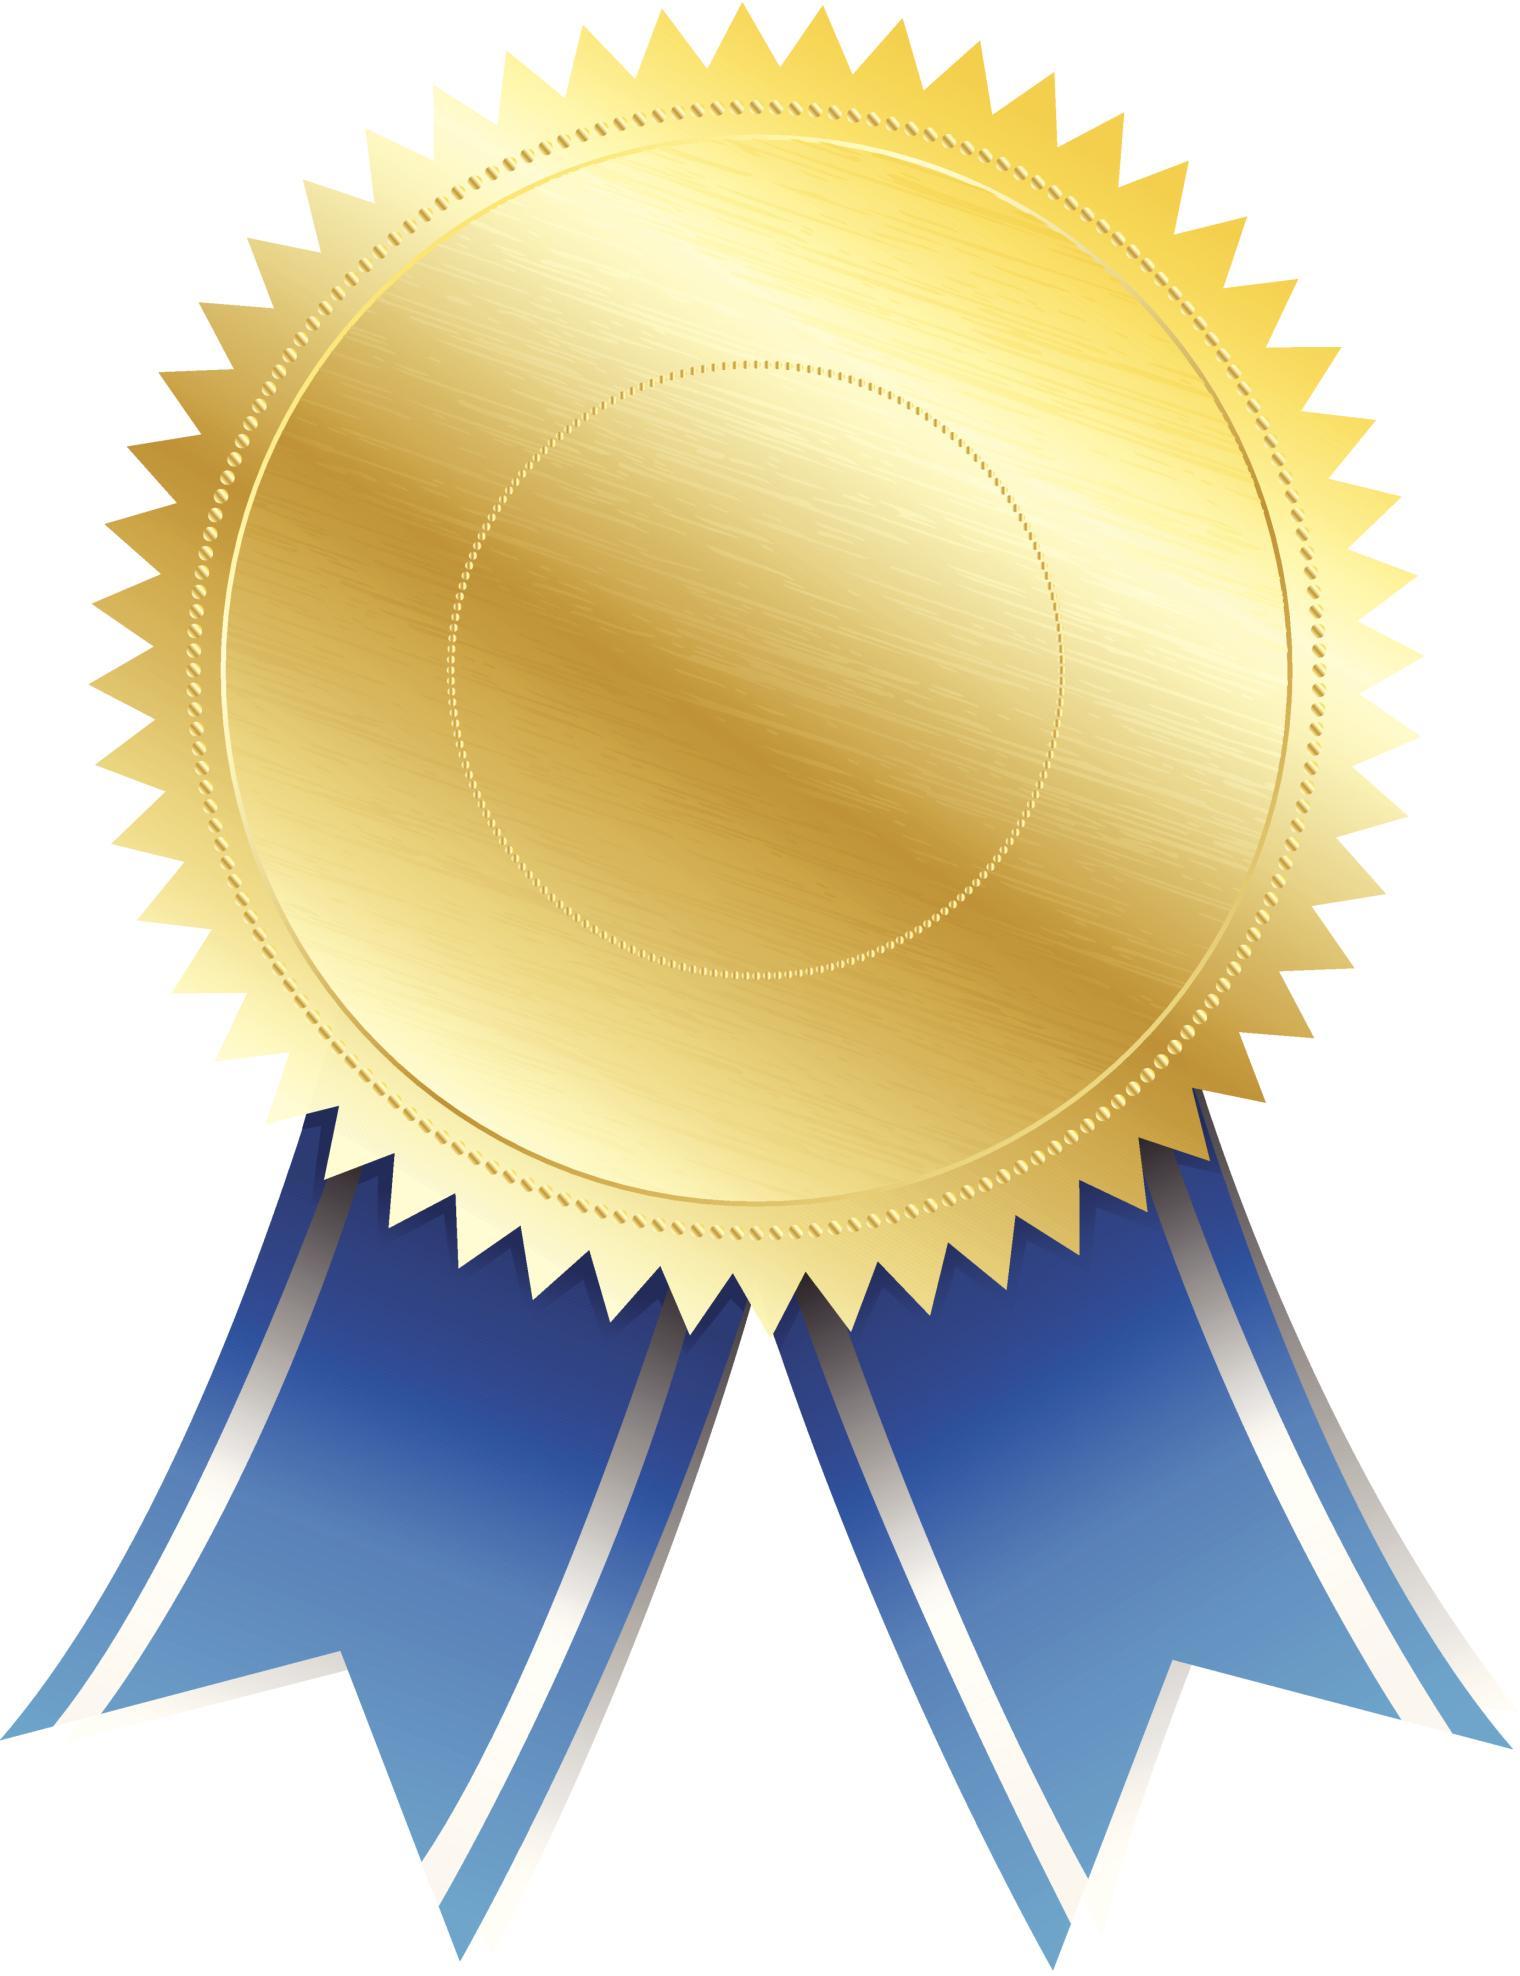 award-clipart-transparent-background-19